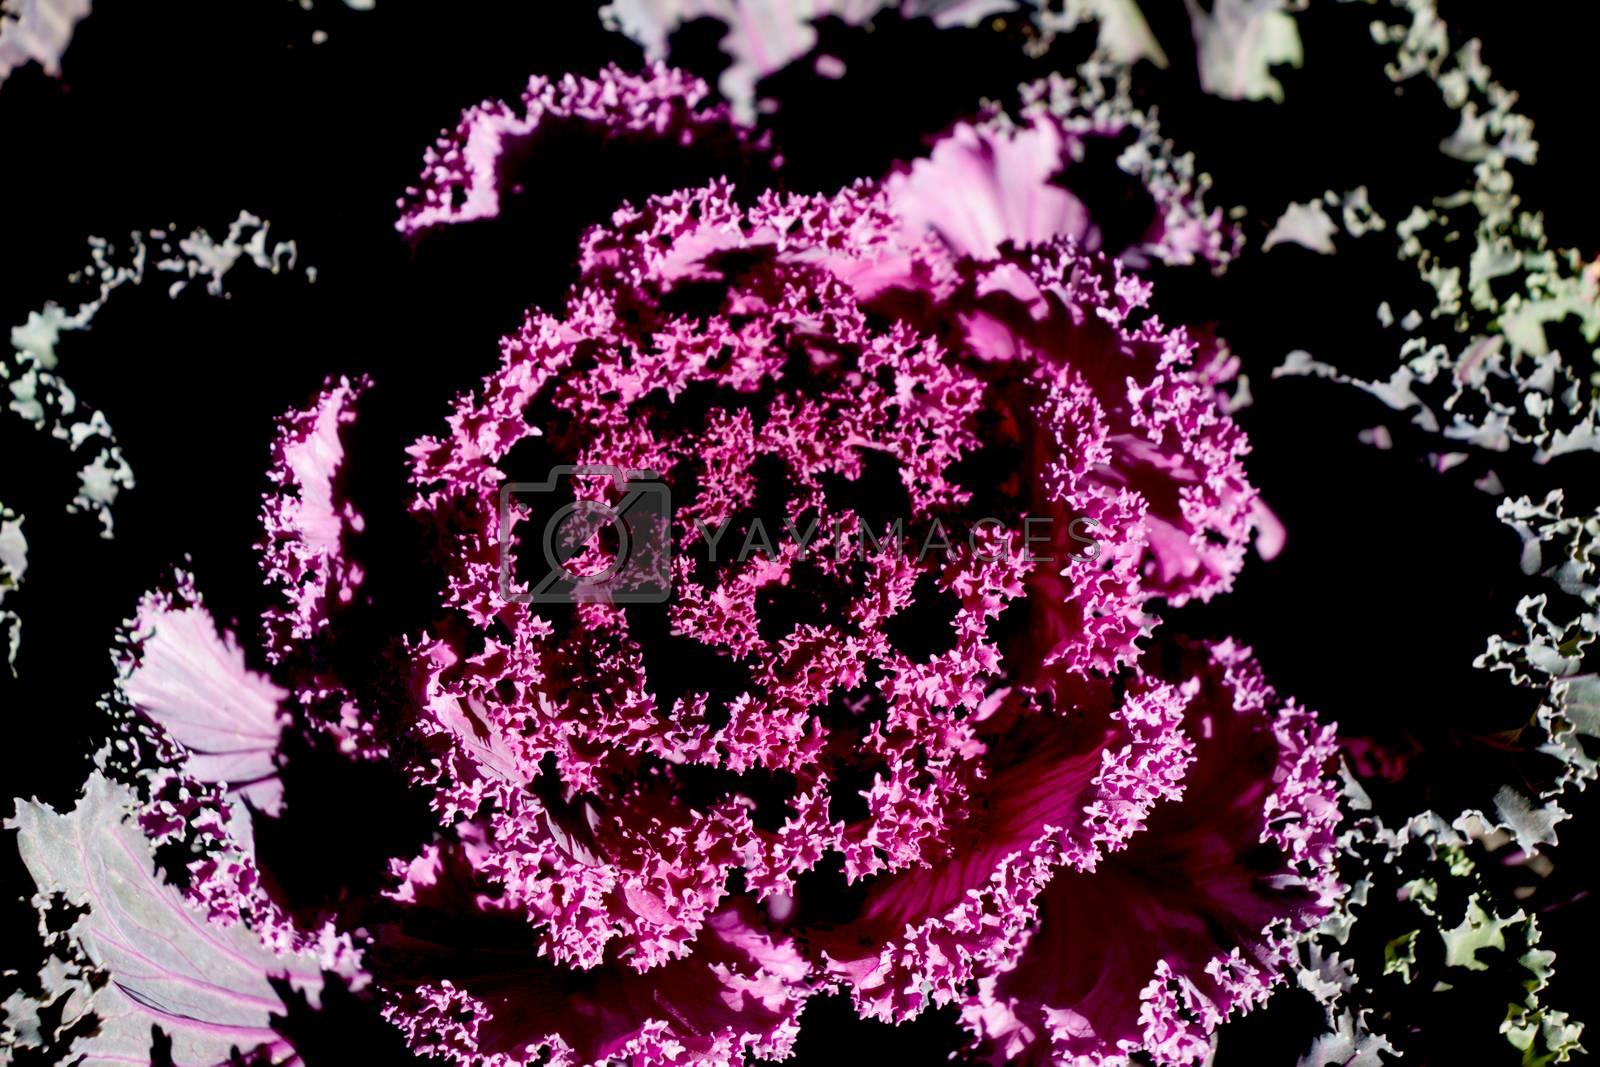 Beautiful Pink lettuce flower in view